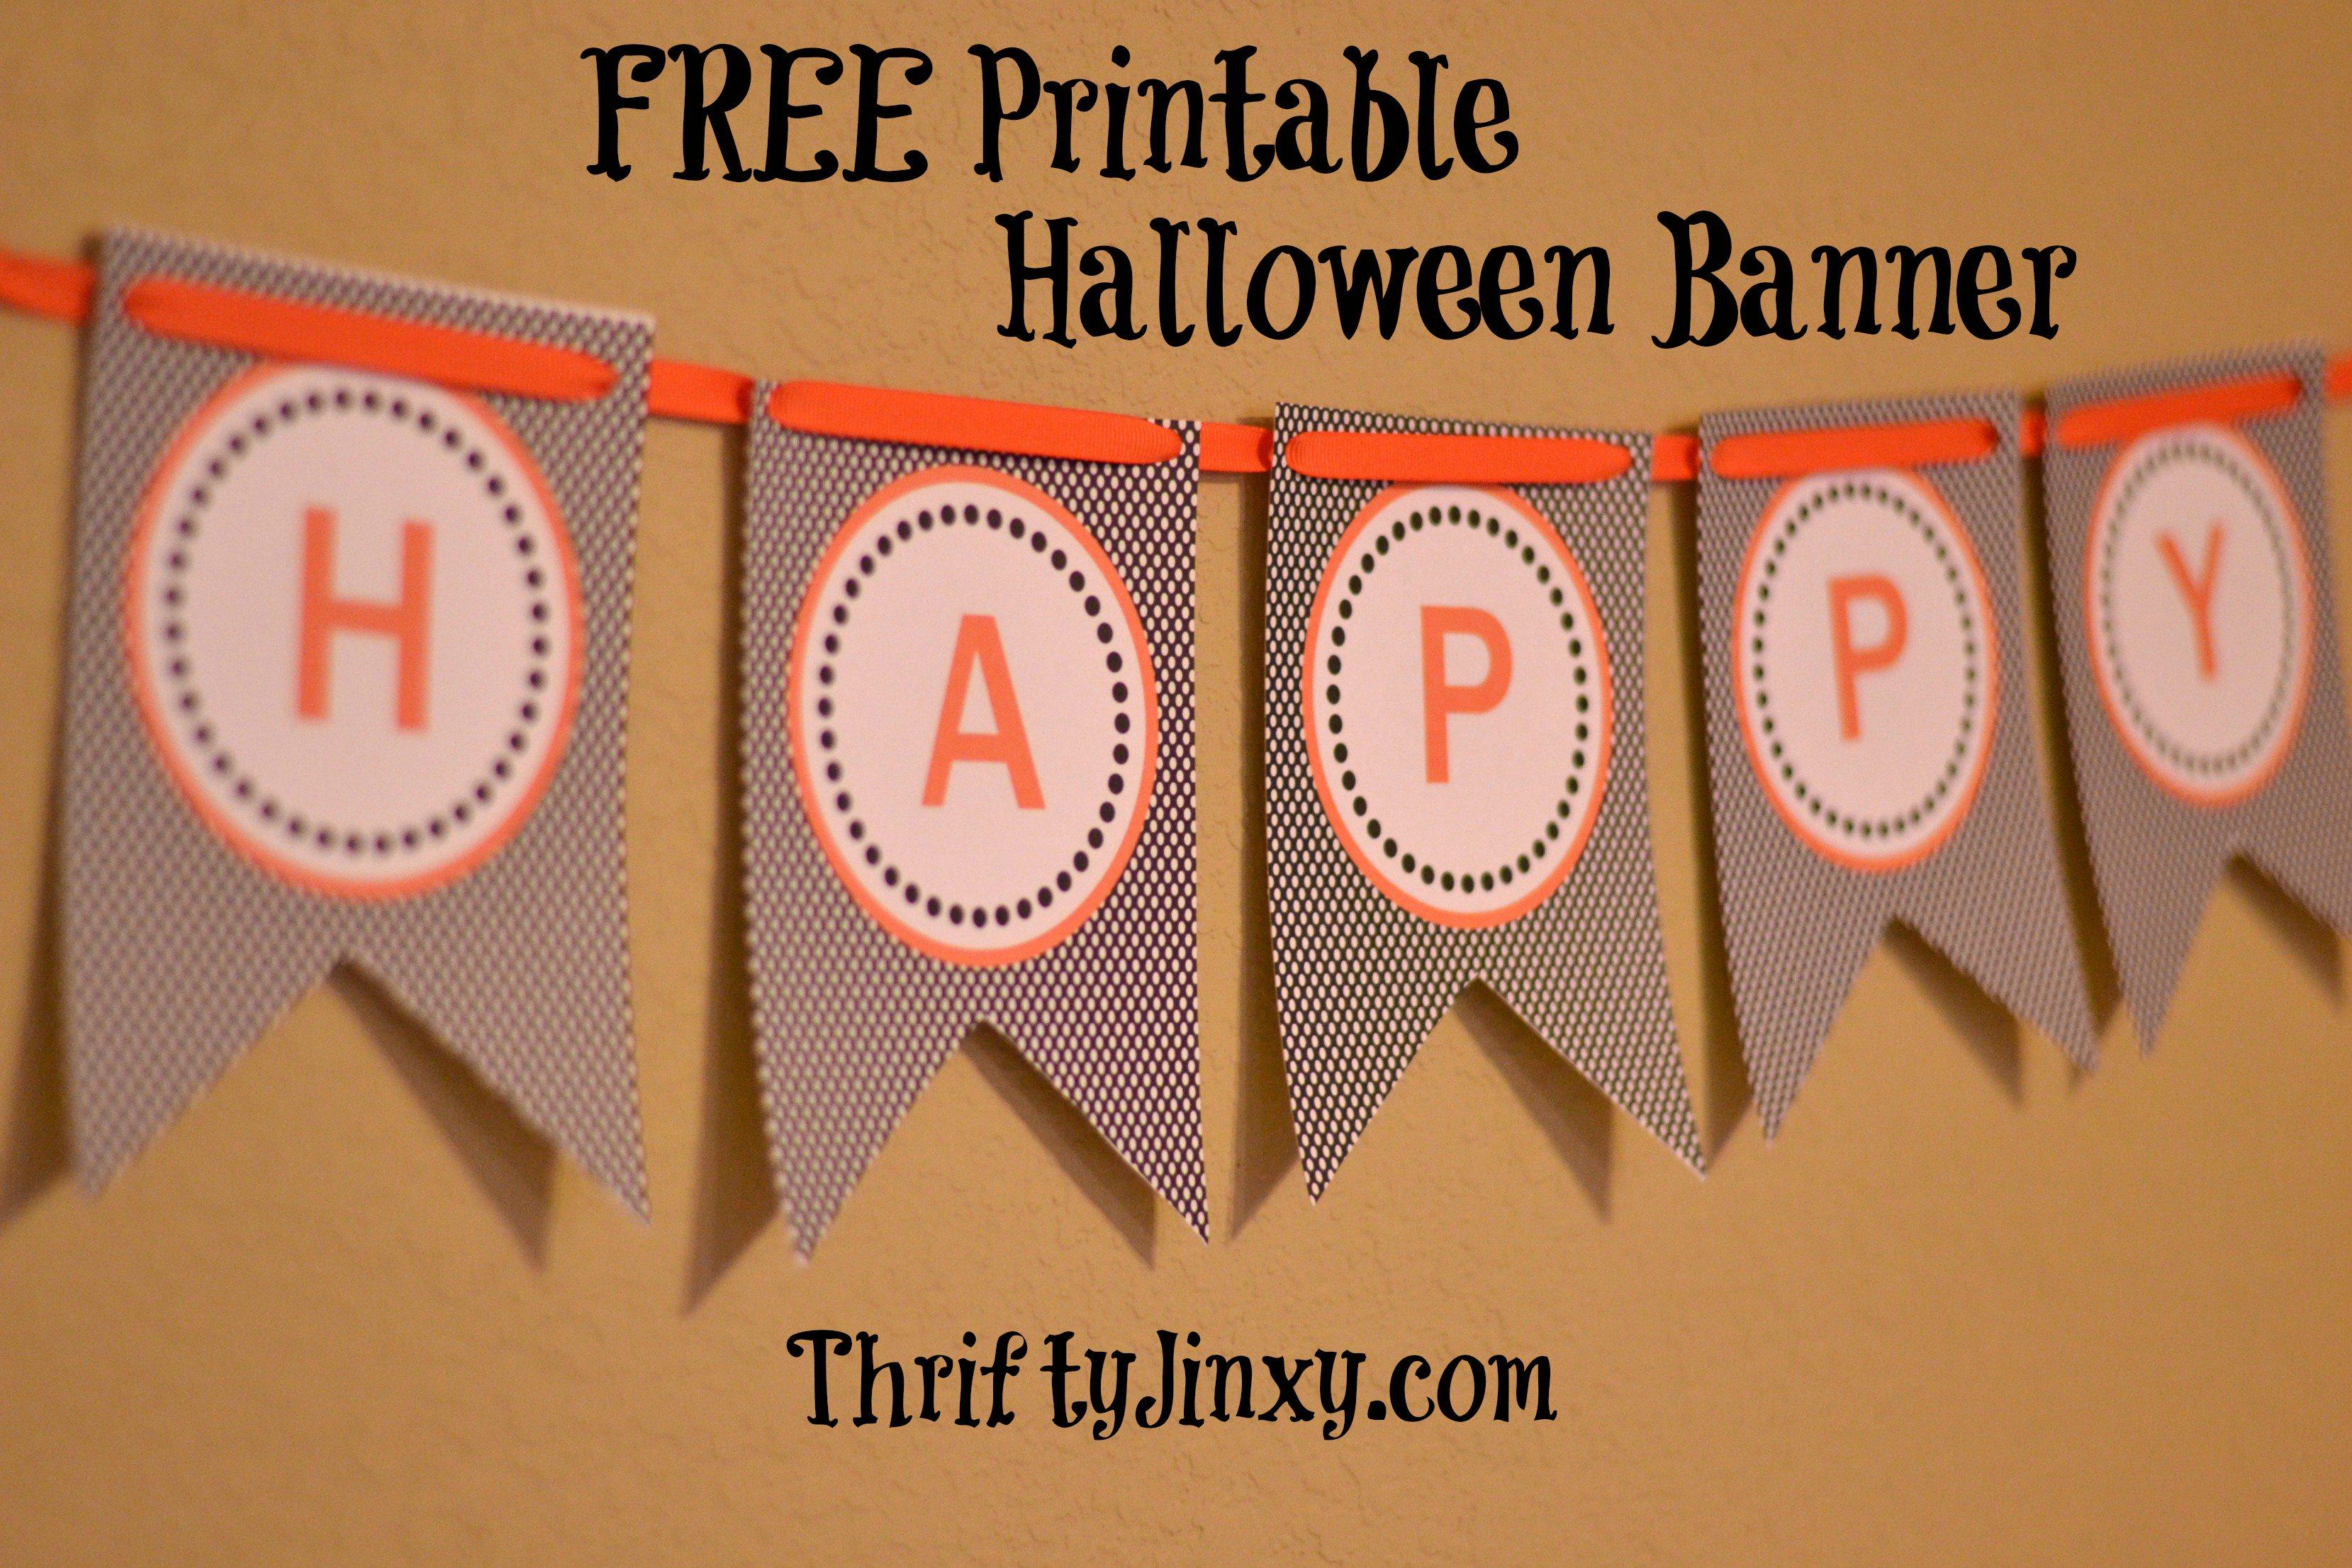 Free Printable Halloween Banner - Thrifty Jinxy - Free Printable Halloween Banner